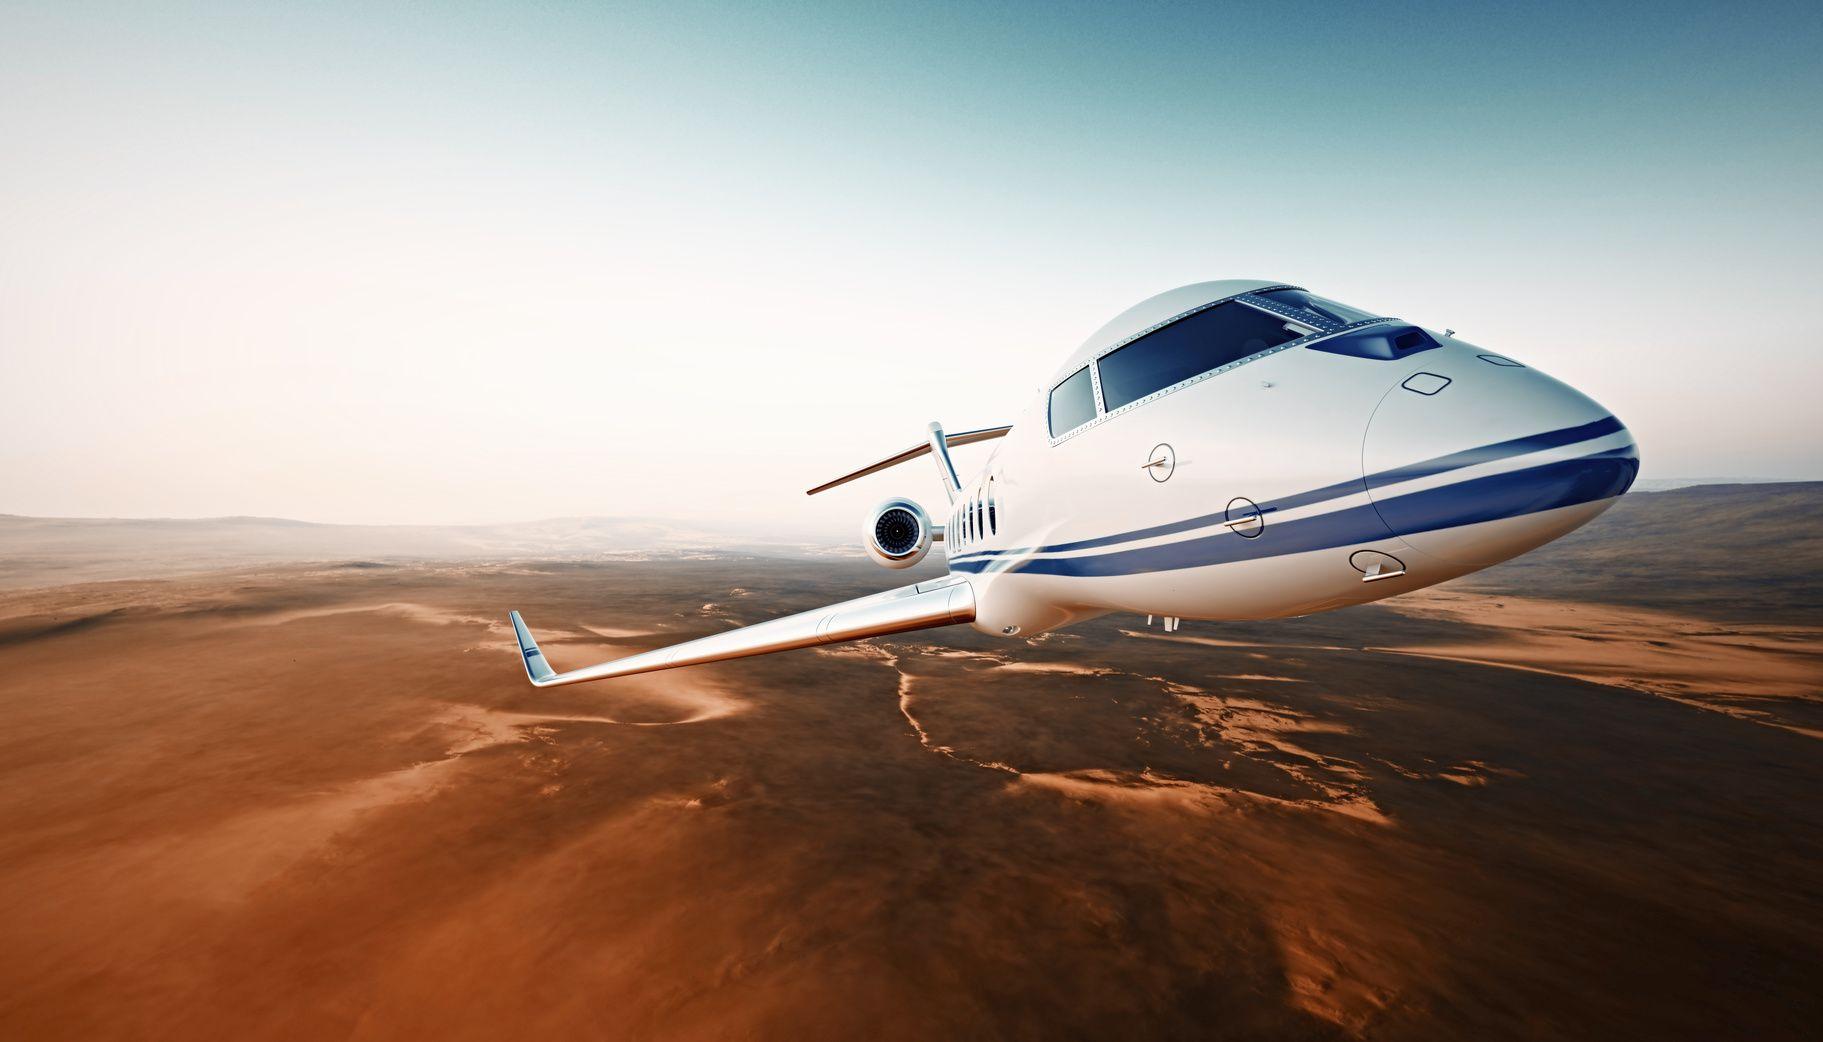 CharterBroker (With images) Air charter, Passenger, Region